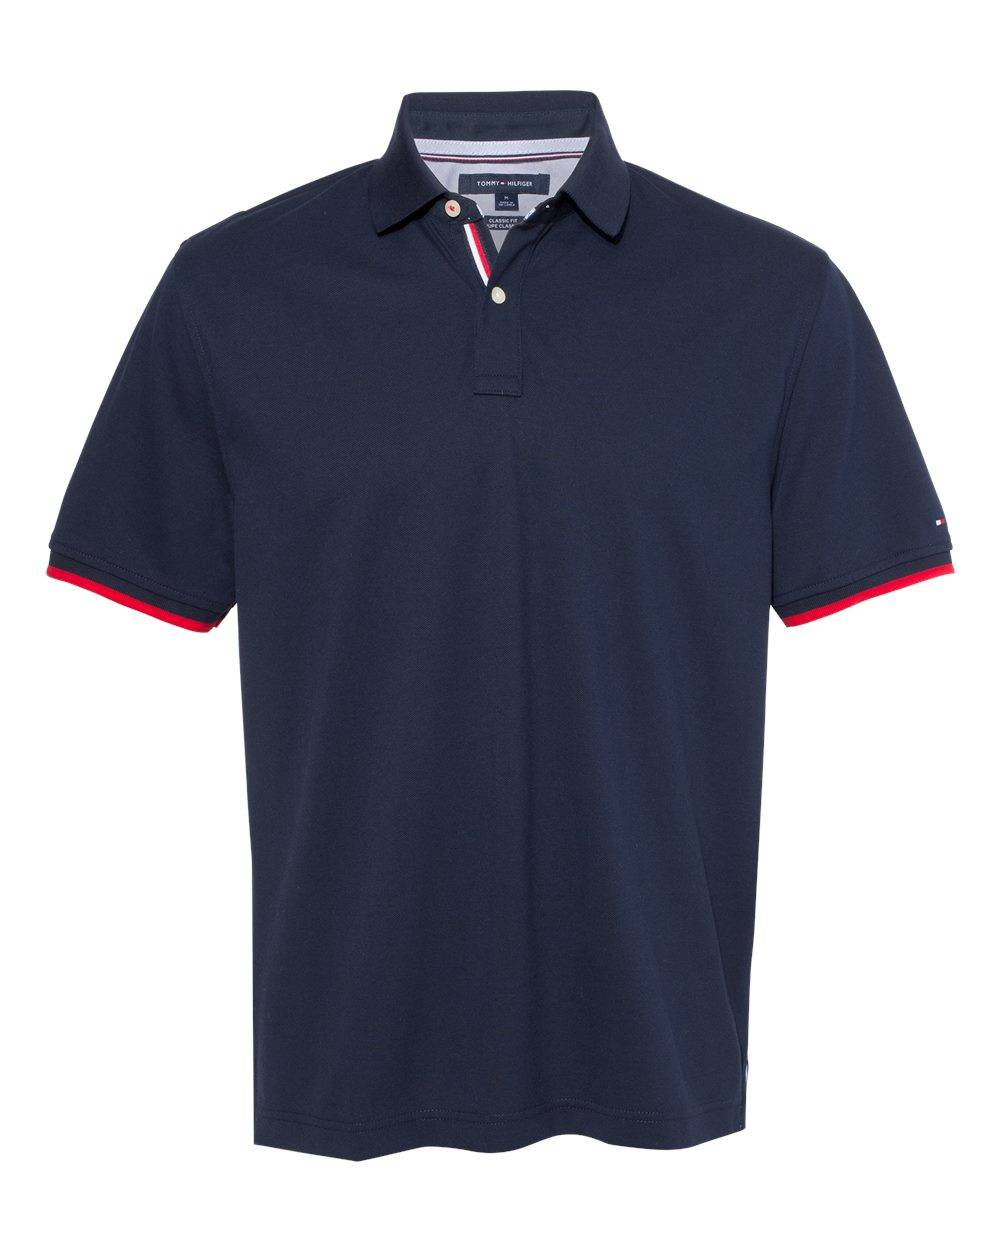 Tommy Hilfiger - Sanders Tipped Cotton Piqu Sport Shirt - 13H2150 - Navy Blazer - 3X-Large